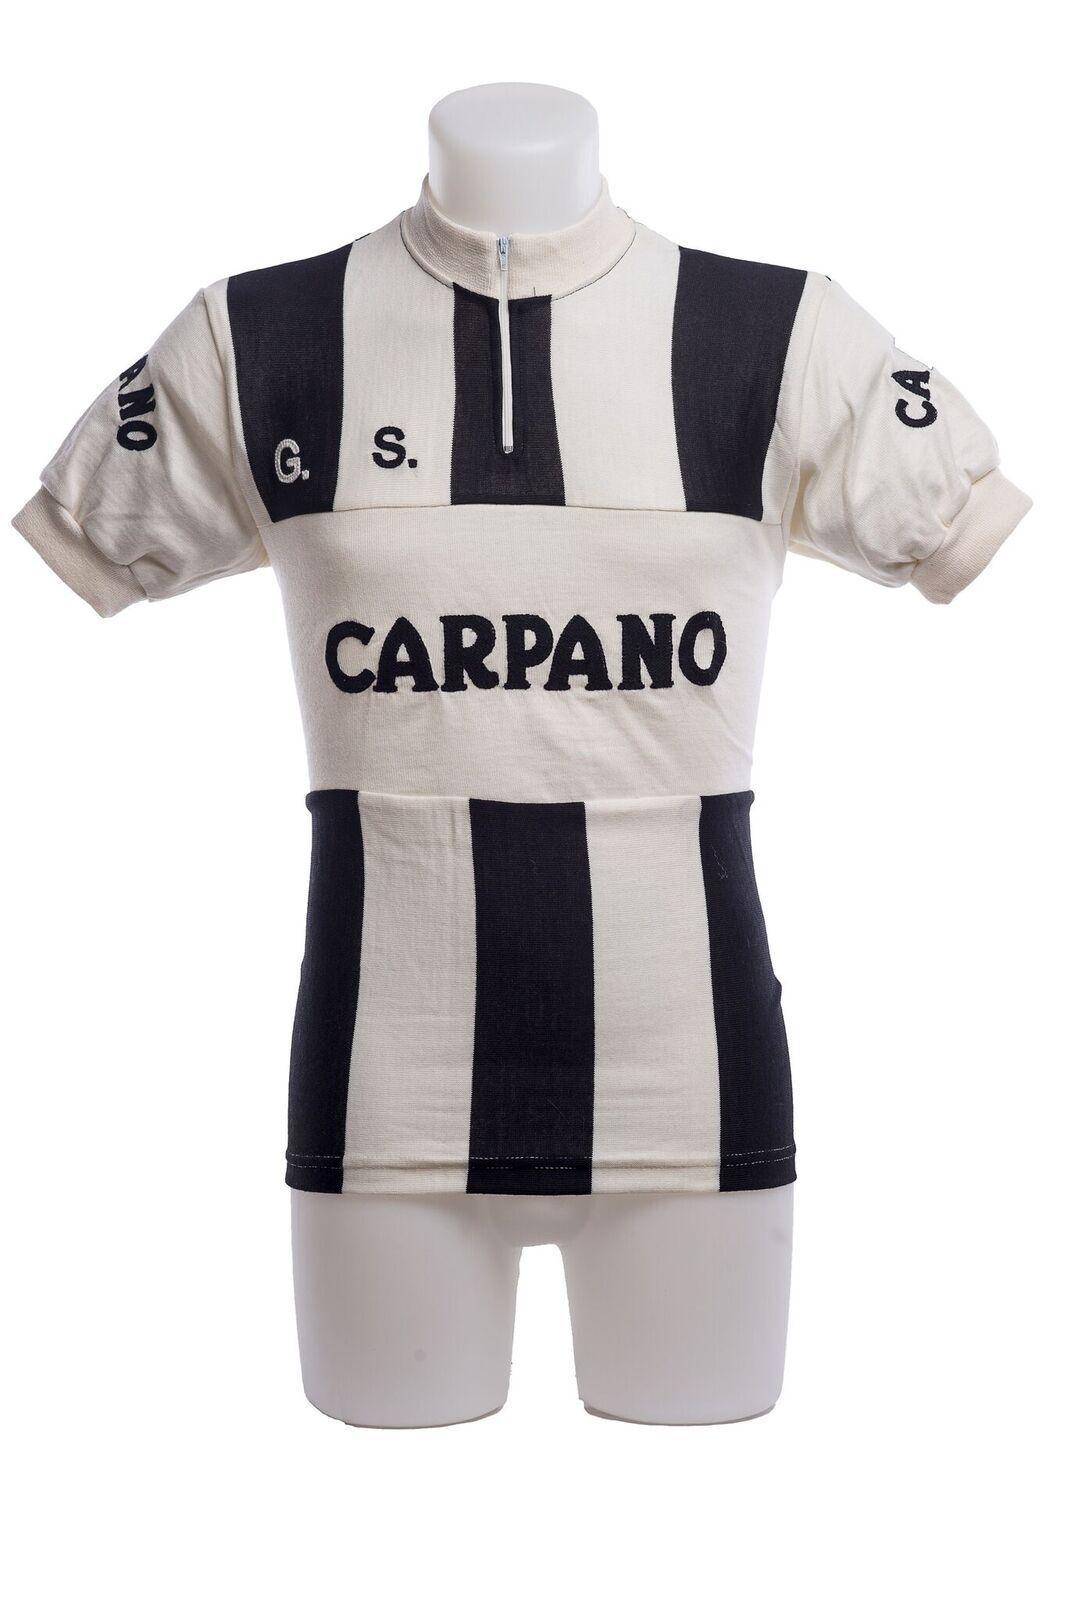 MAGLIA CARPANO 1960 CICLISMO VINTAGE